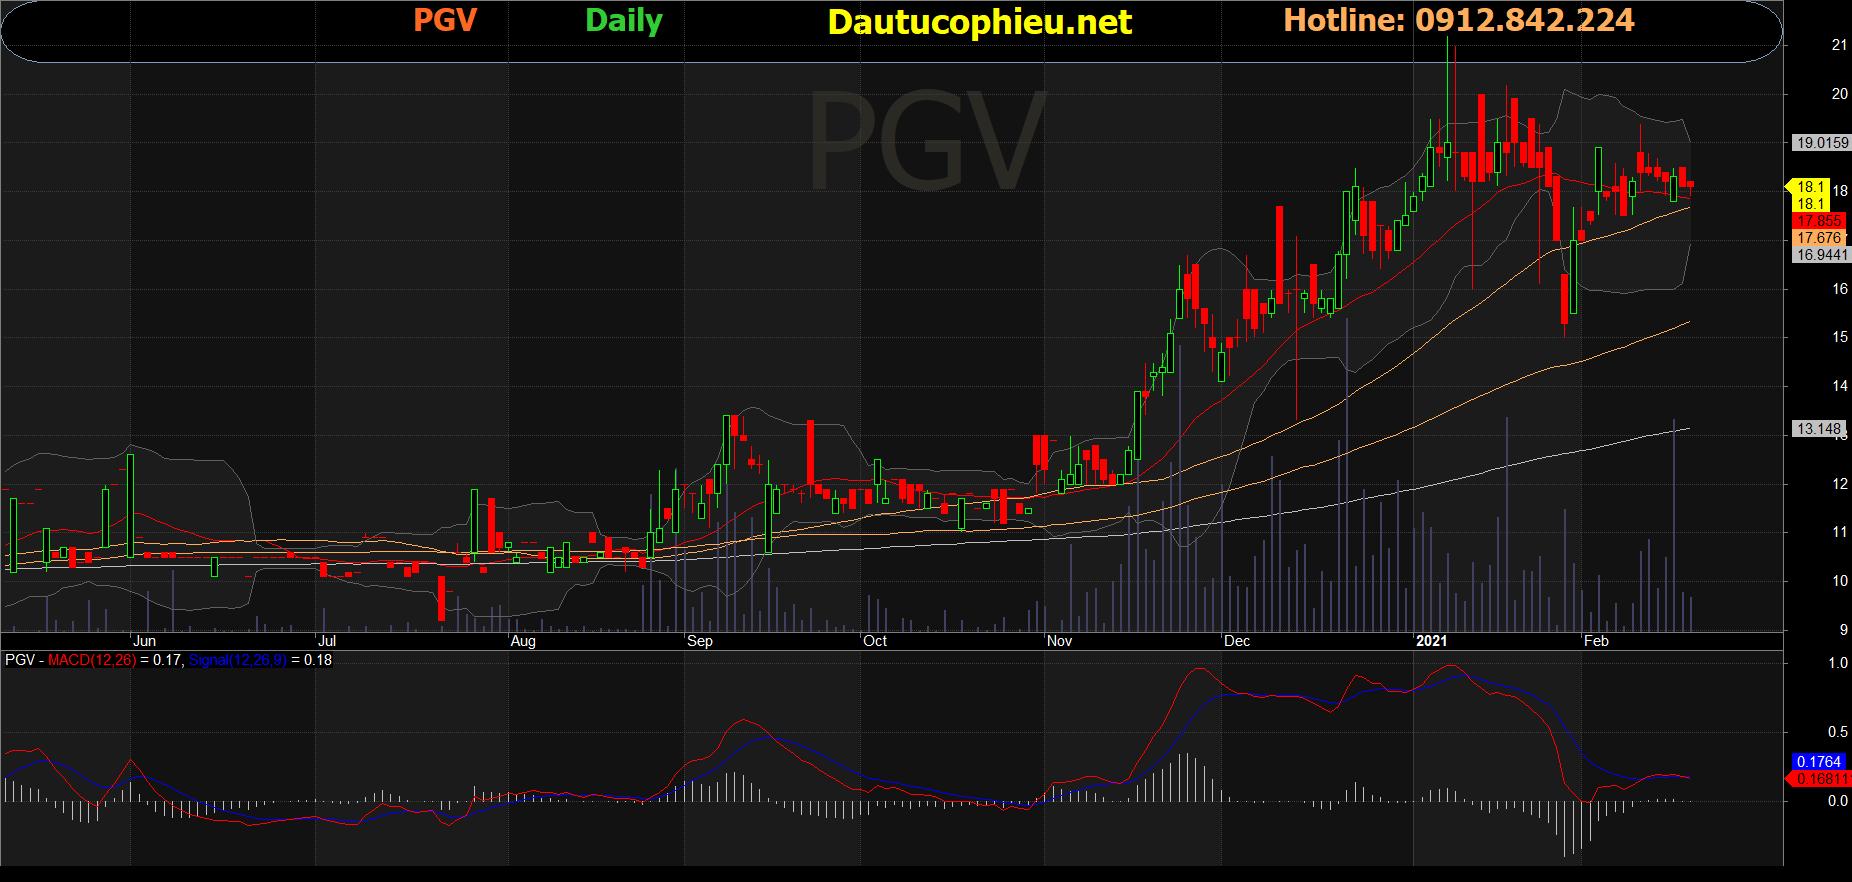 Cổ phiếu PGV